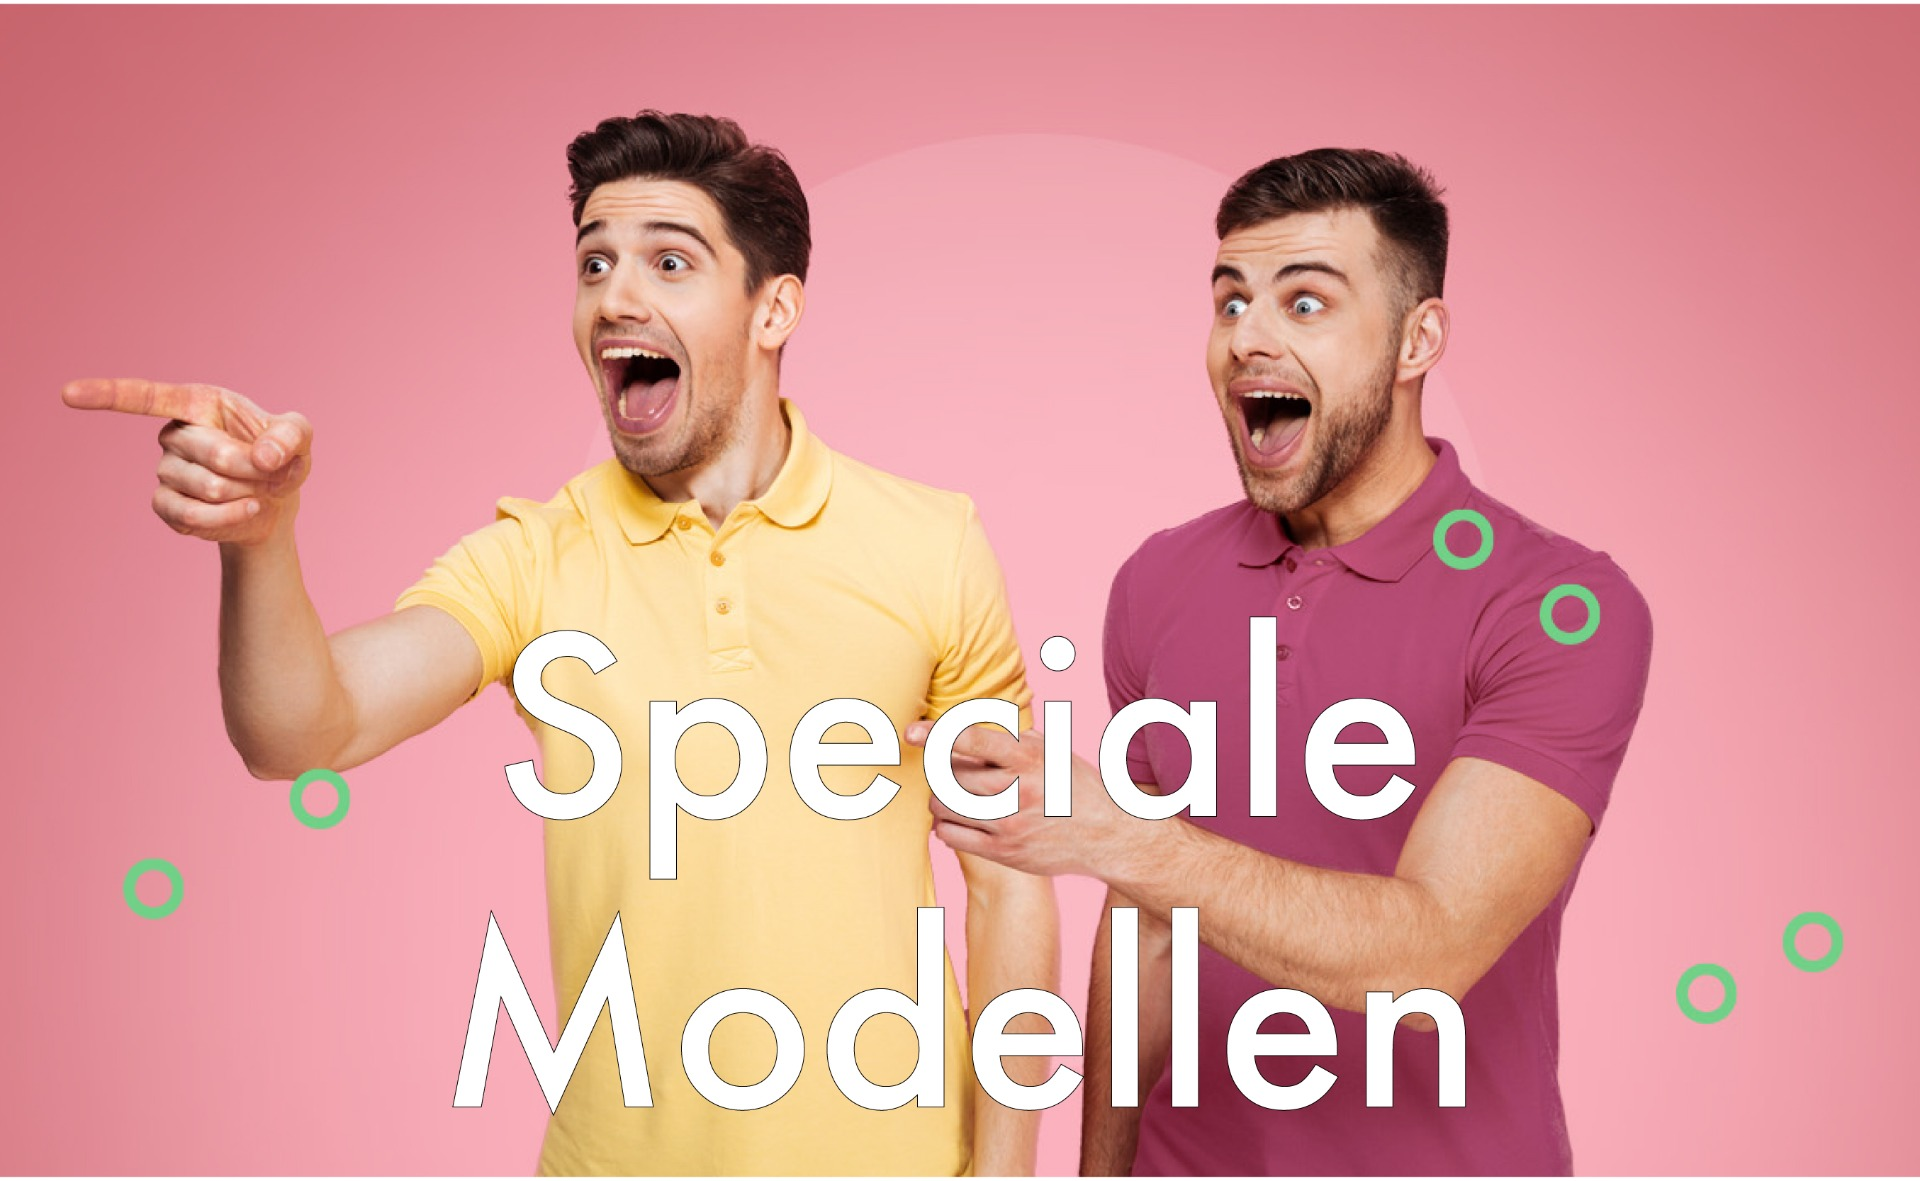 Speciale modellen